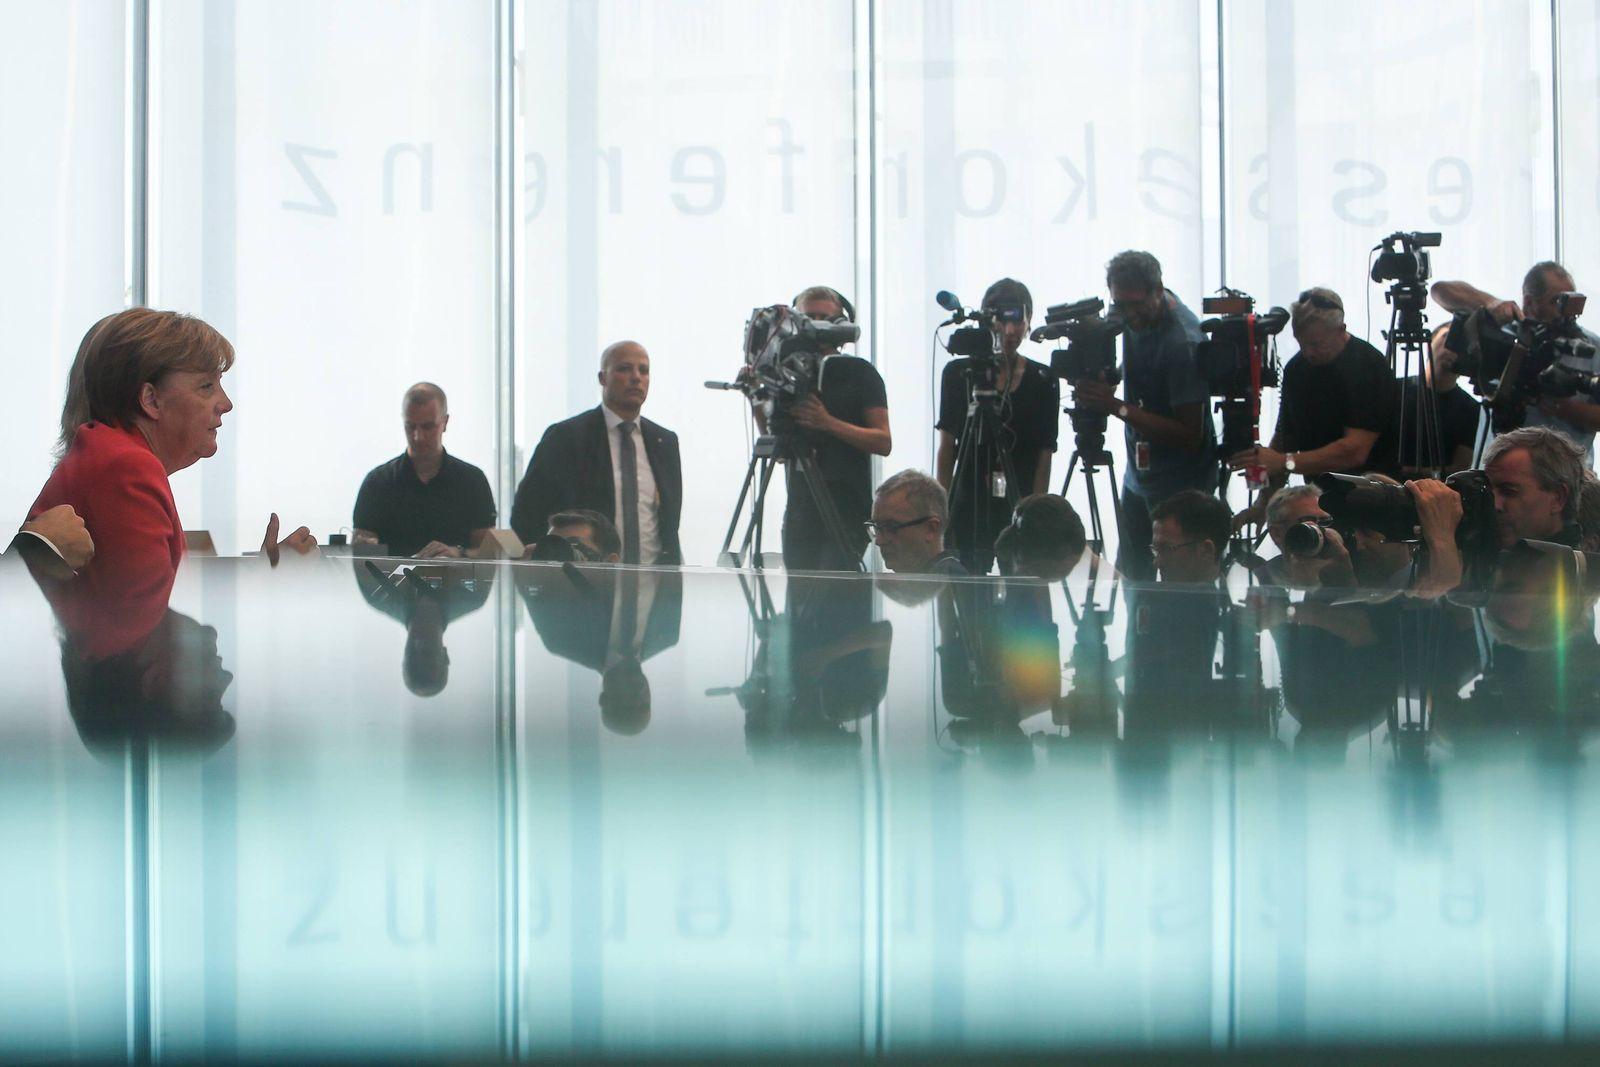 POLITIK Angela Merkel - Sommerpressekonferenz in Berlin (150831) -- BERLIN, Aug. 31, 2015 -- German Chancellor Angela M